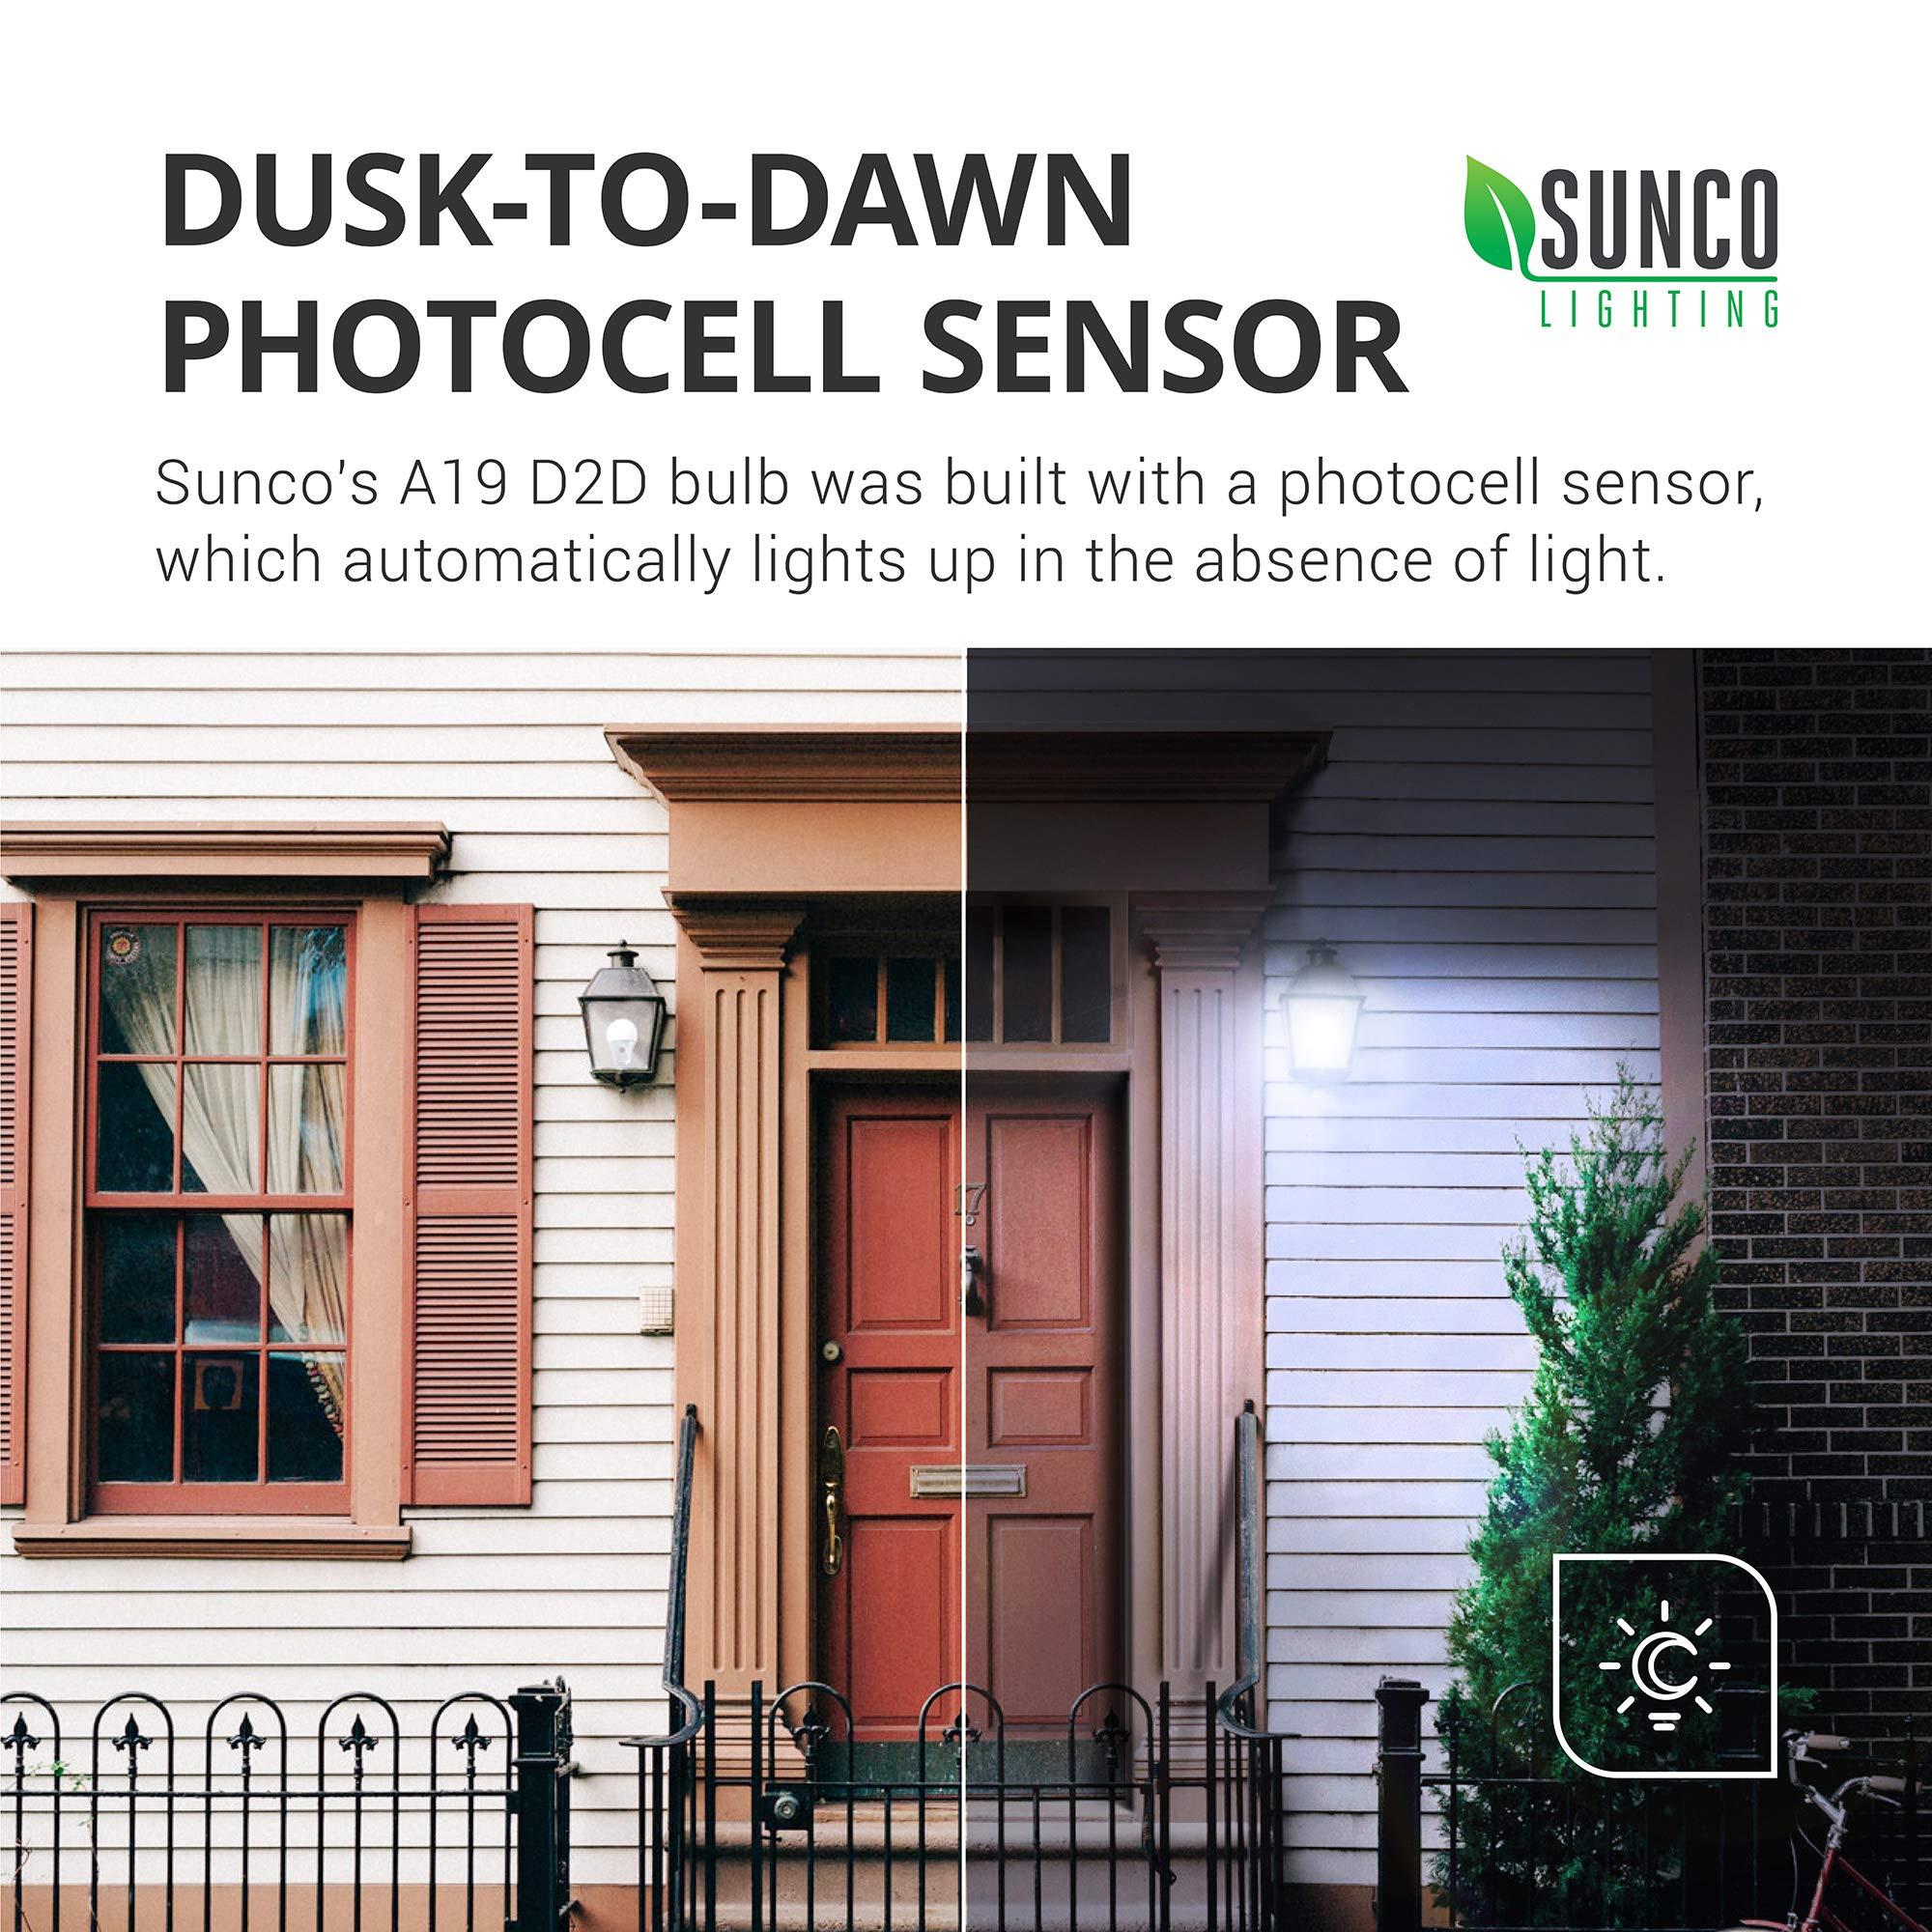 Sunco Lighting 2 Pack A19 LED Bulb with Dusk-to-Dawn, 9W=60W, 800 LM, 2700K Soft White, Auto On/Off Photocell Sensor - UL